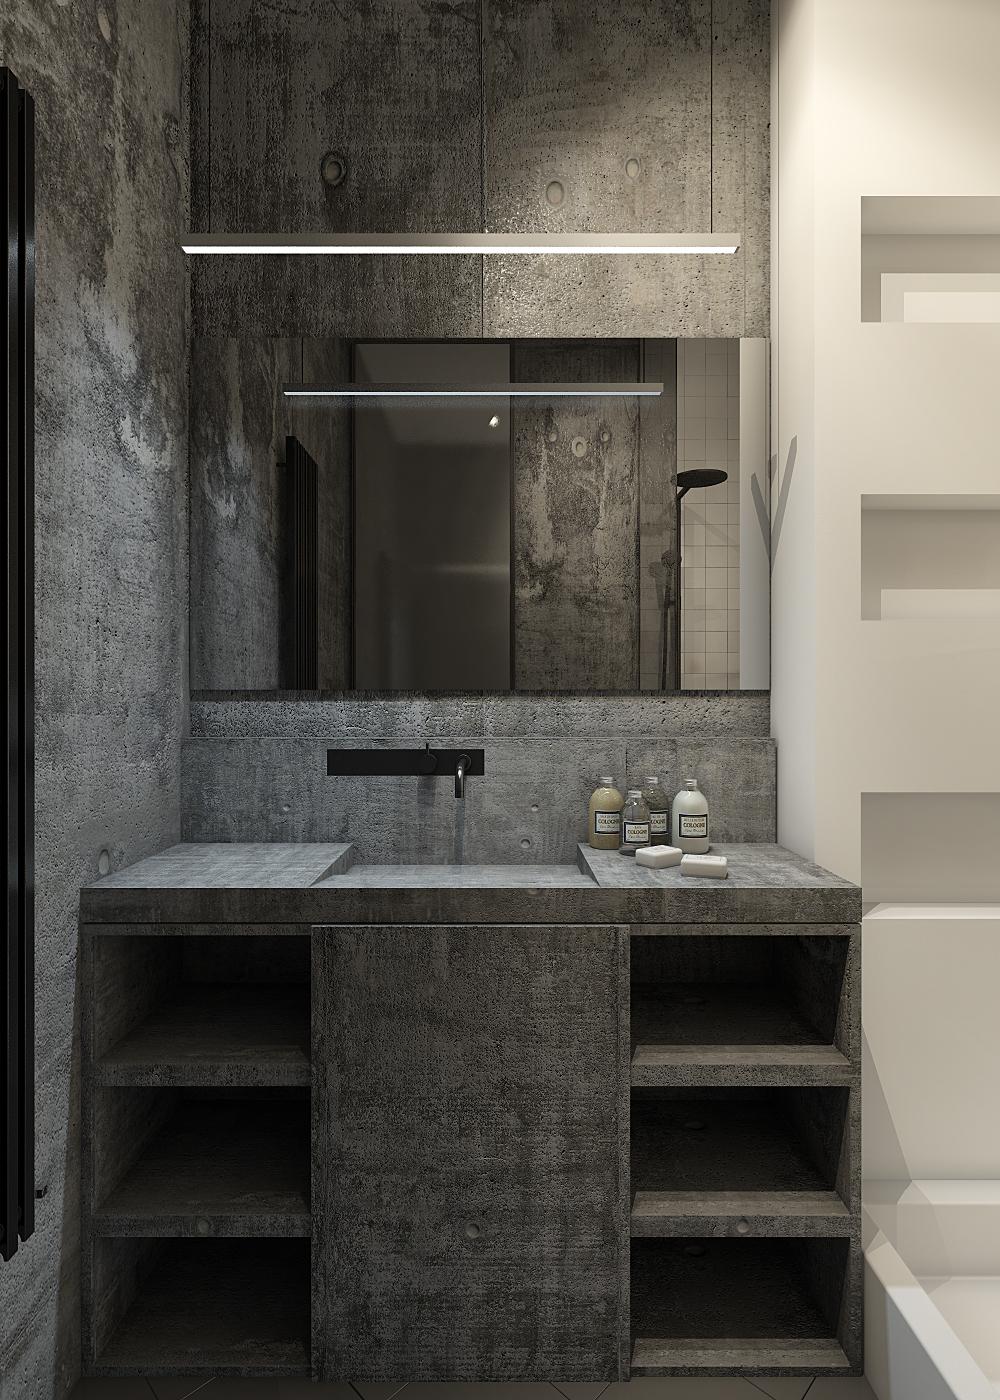 Eclectic Apartment Kitchen